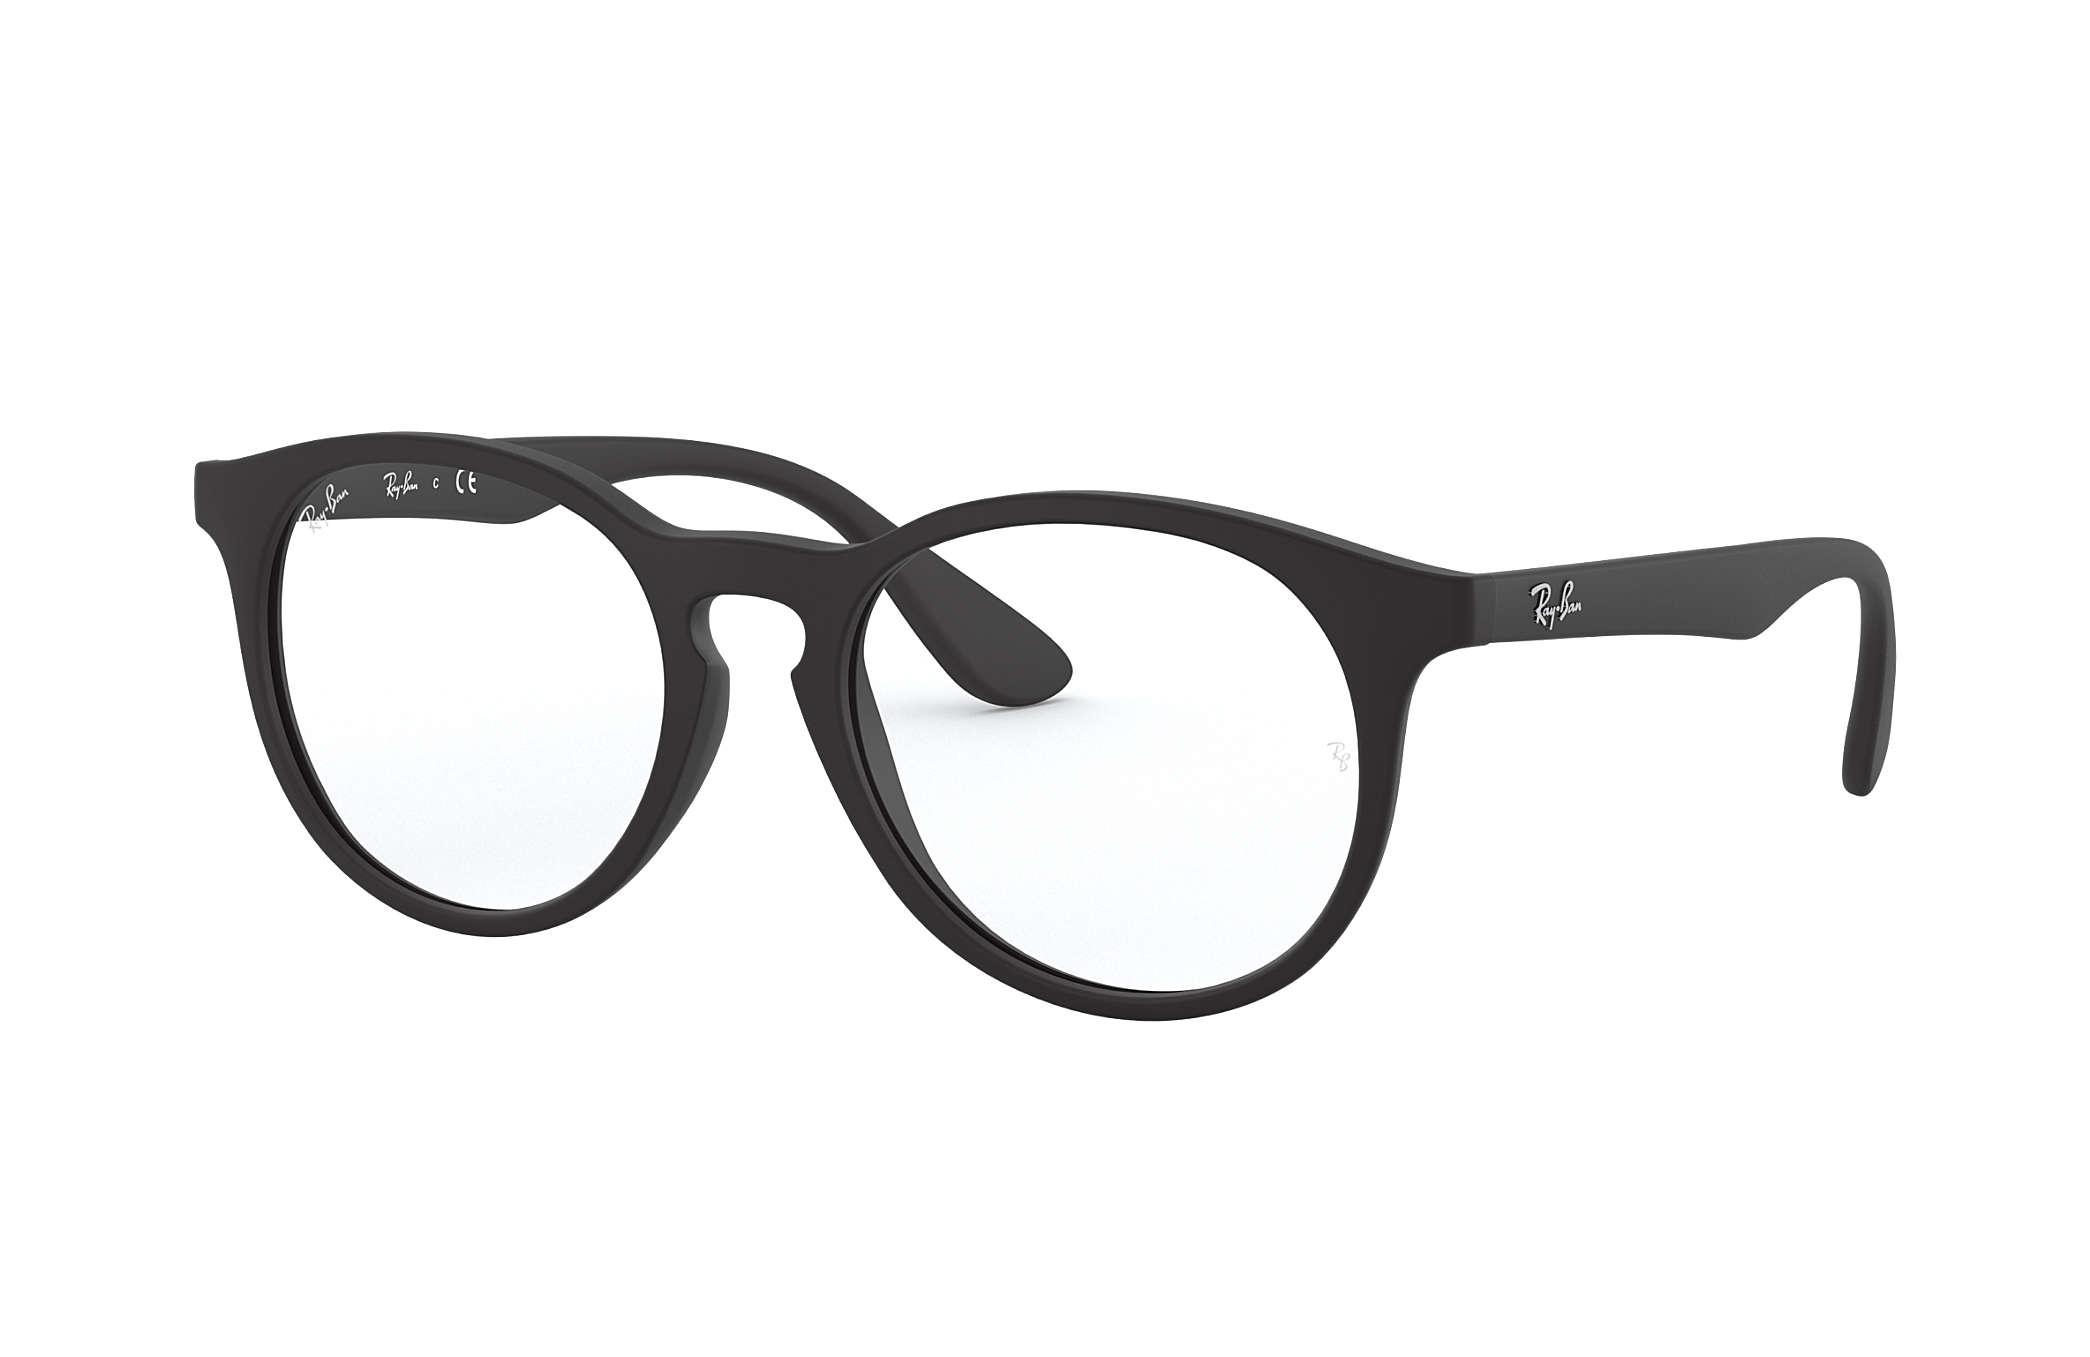 Ray-Ban eyeglasses RY1554 Black - Injected - 0RY1554361548   Ray-Ban ... cd7fc8d86ffb